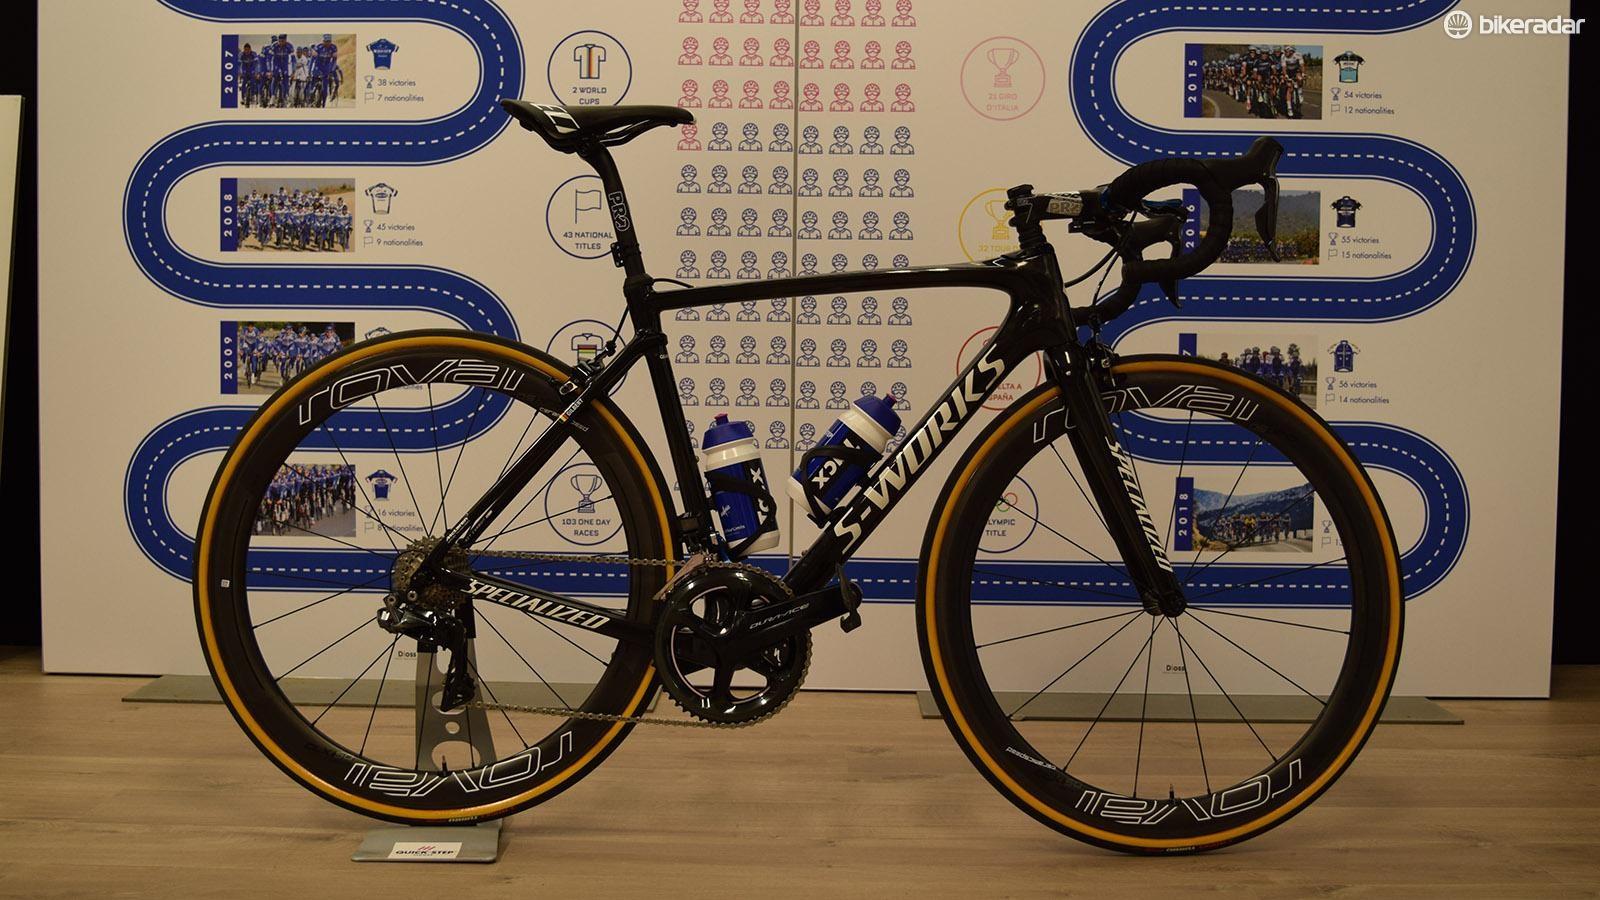 Philippe Gilbert's Specialized S-Works Roubaix rim brake for Paris-Roubaix 2018